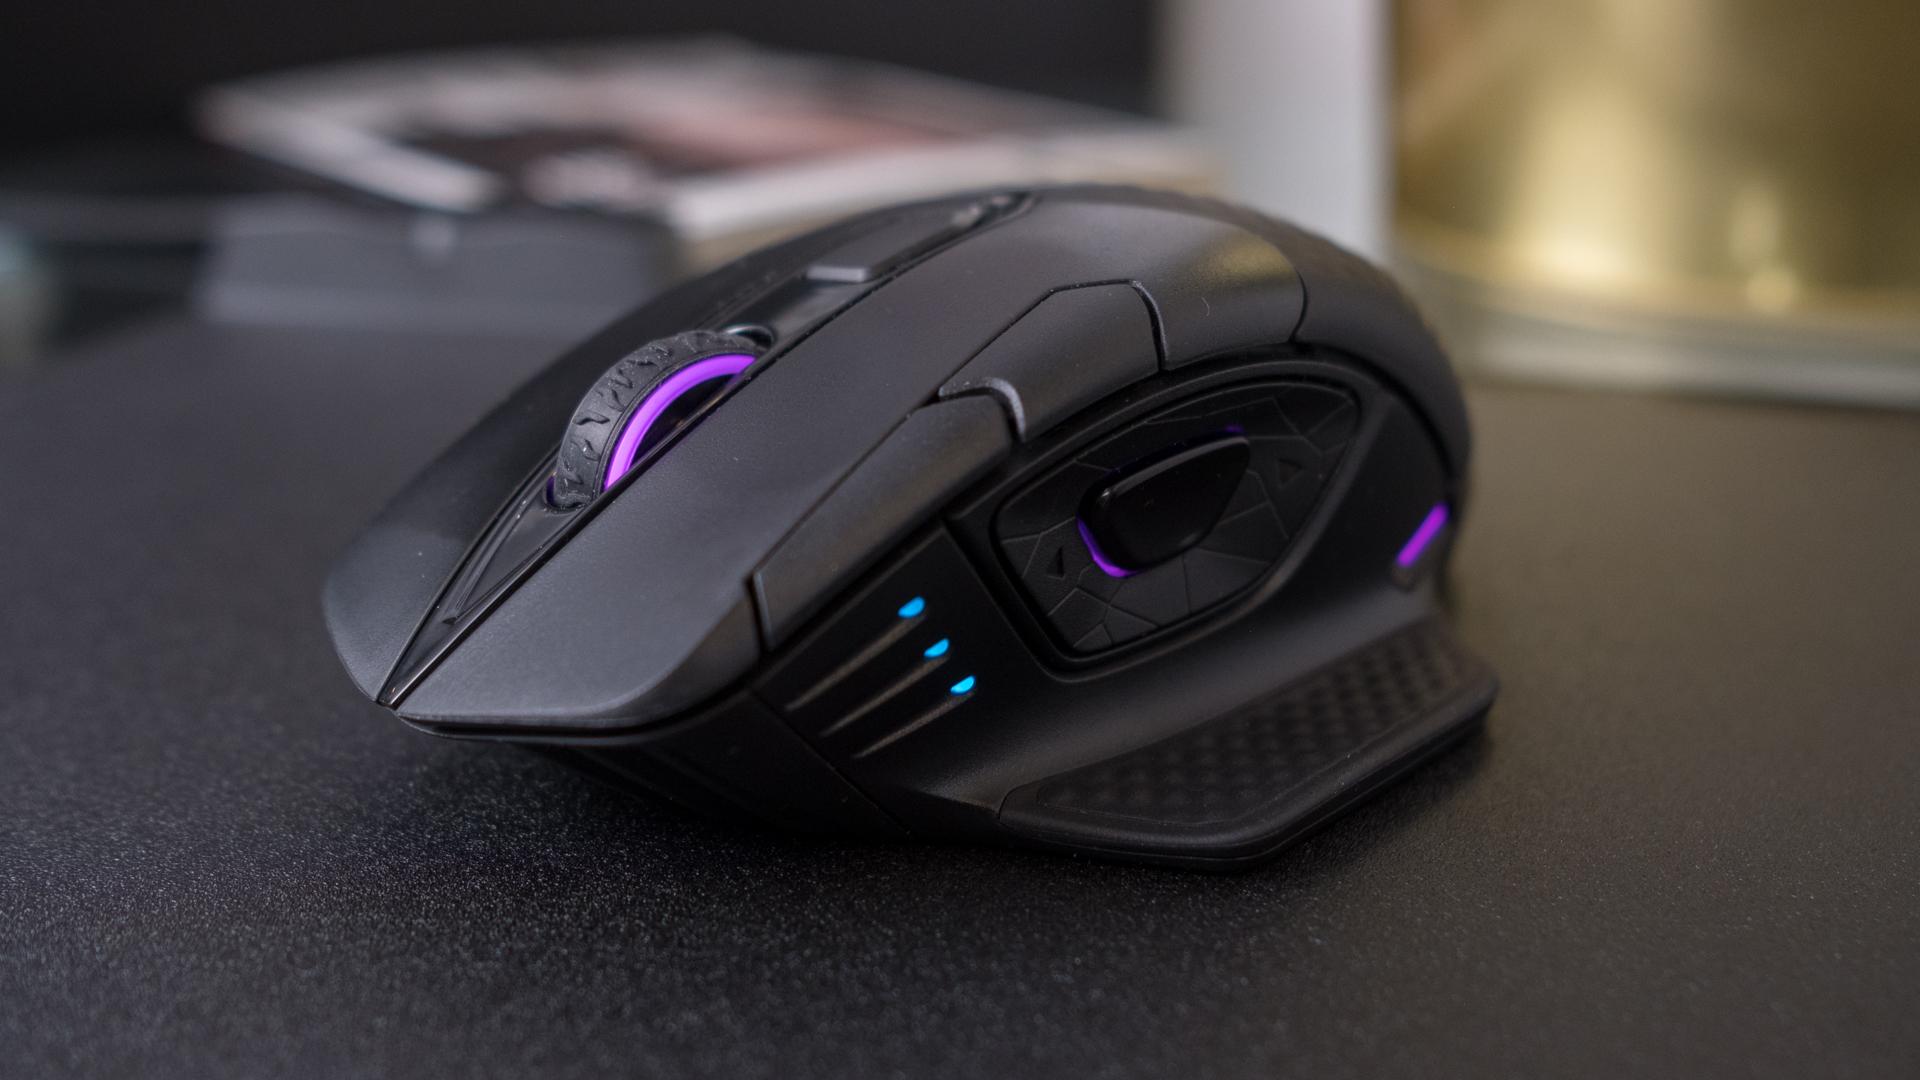 Corsair Dark Core RGB SE mouse